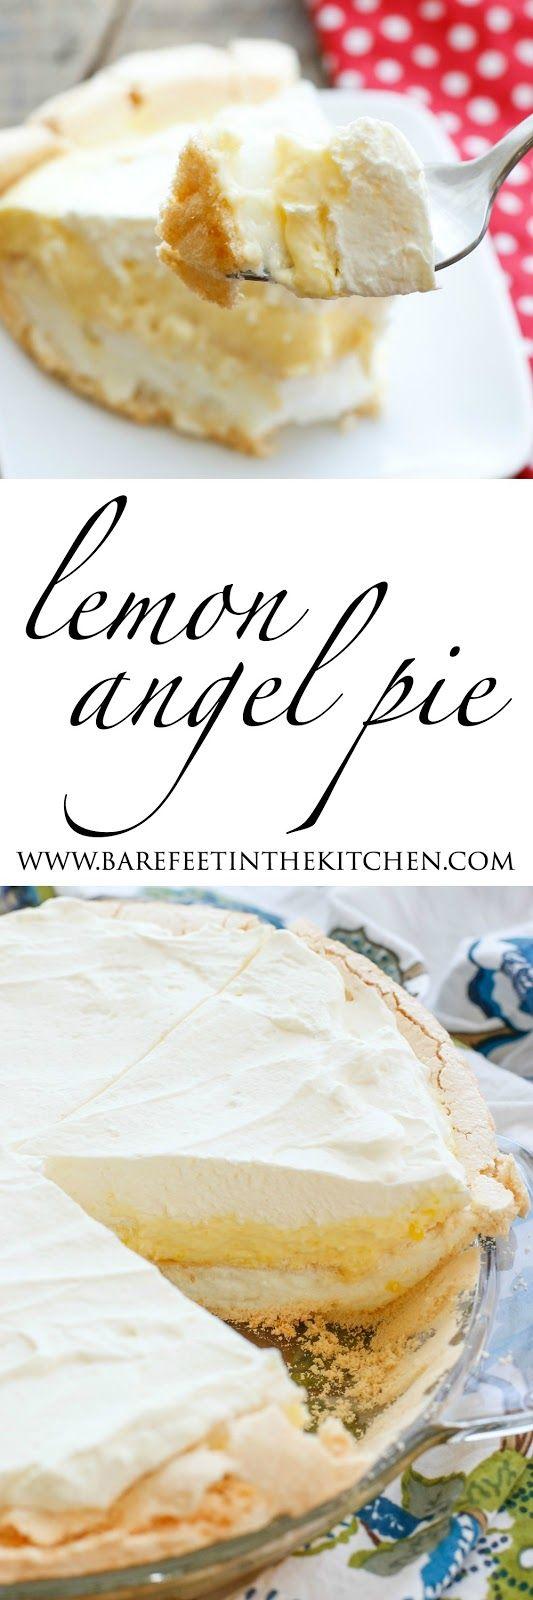 Barefeet In The Kitchen: Lemon Angel Pie